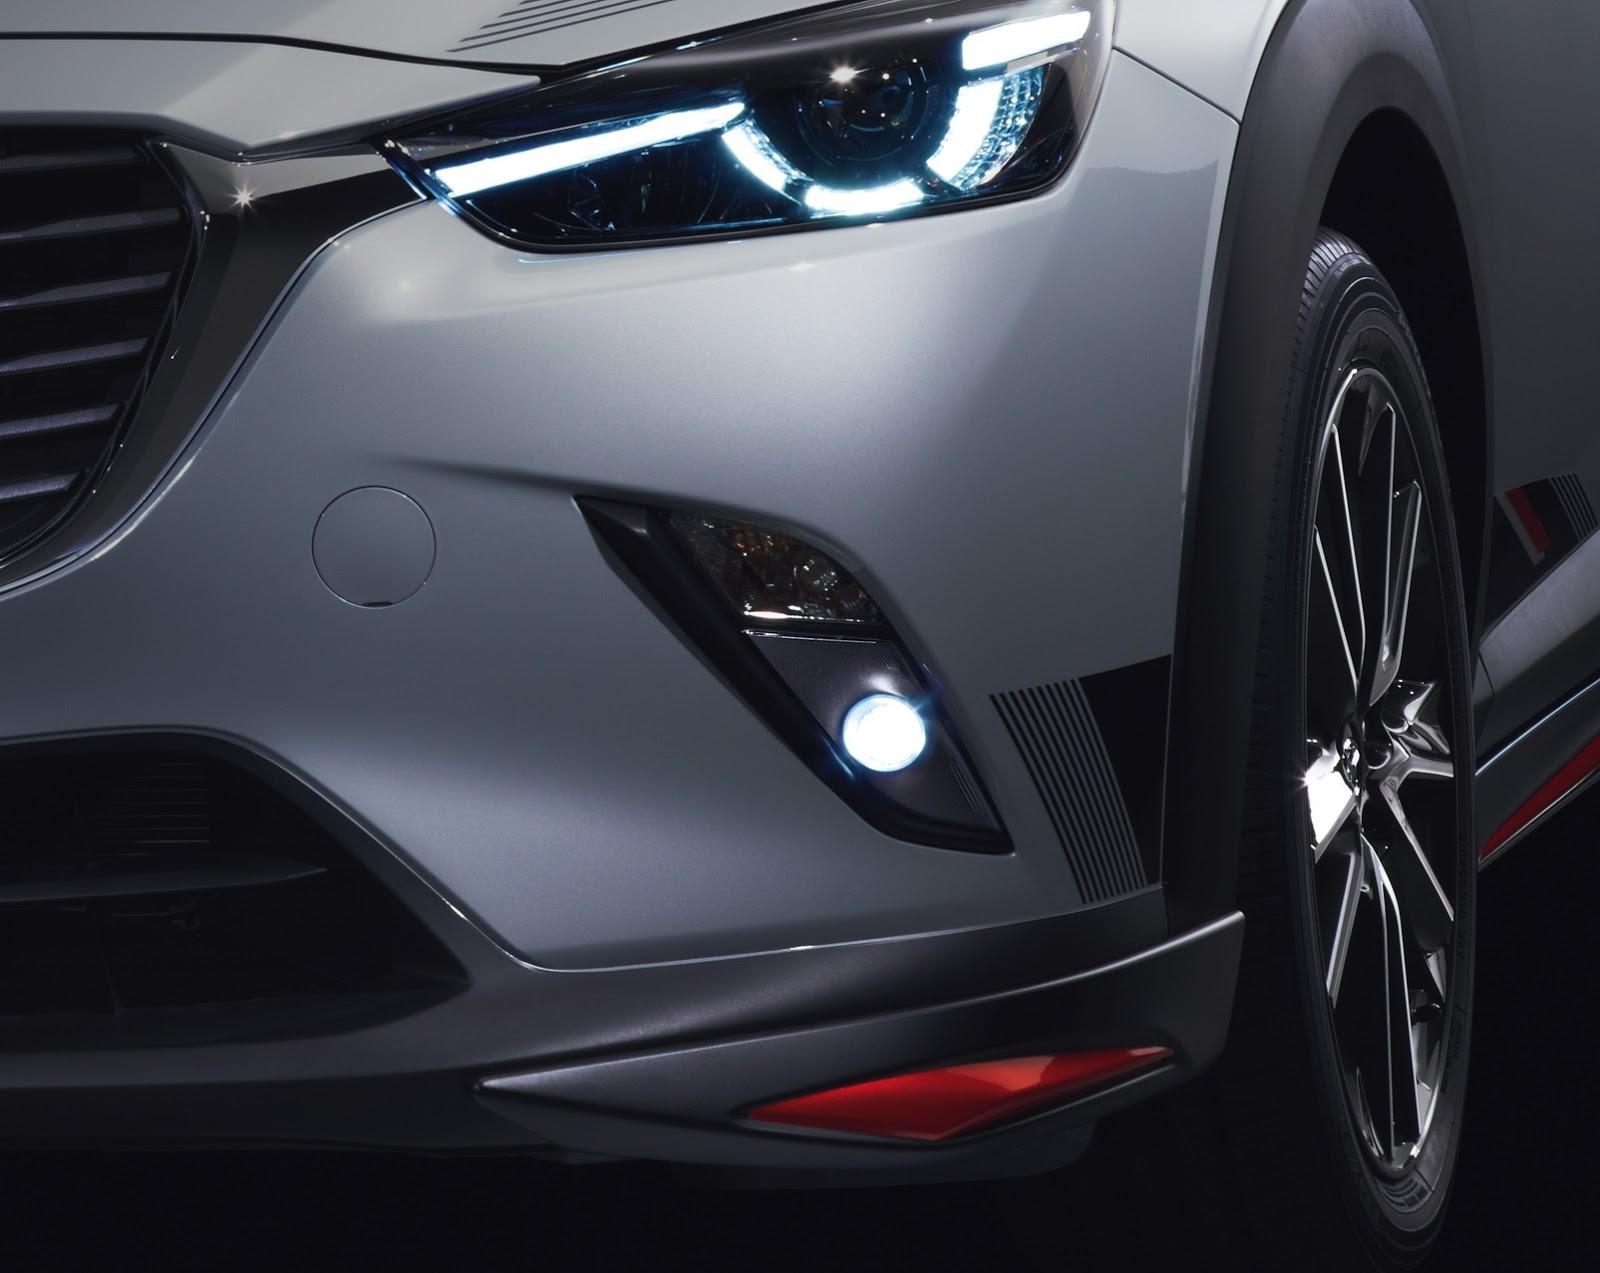 Foto de Accesorios para Mazda CX-3 - CX-5 (1/12)